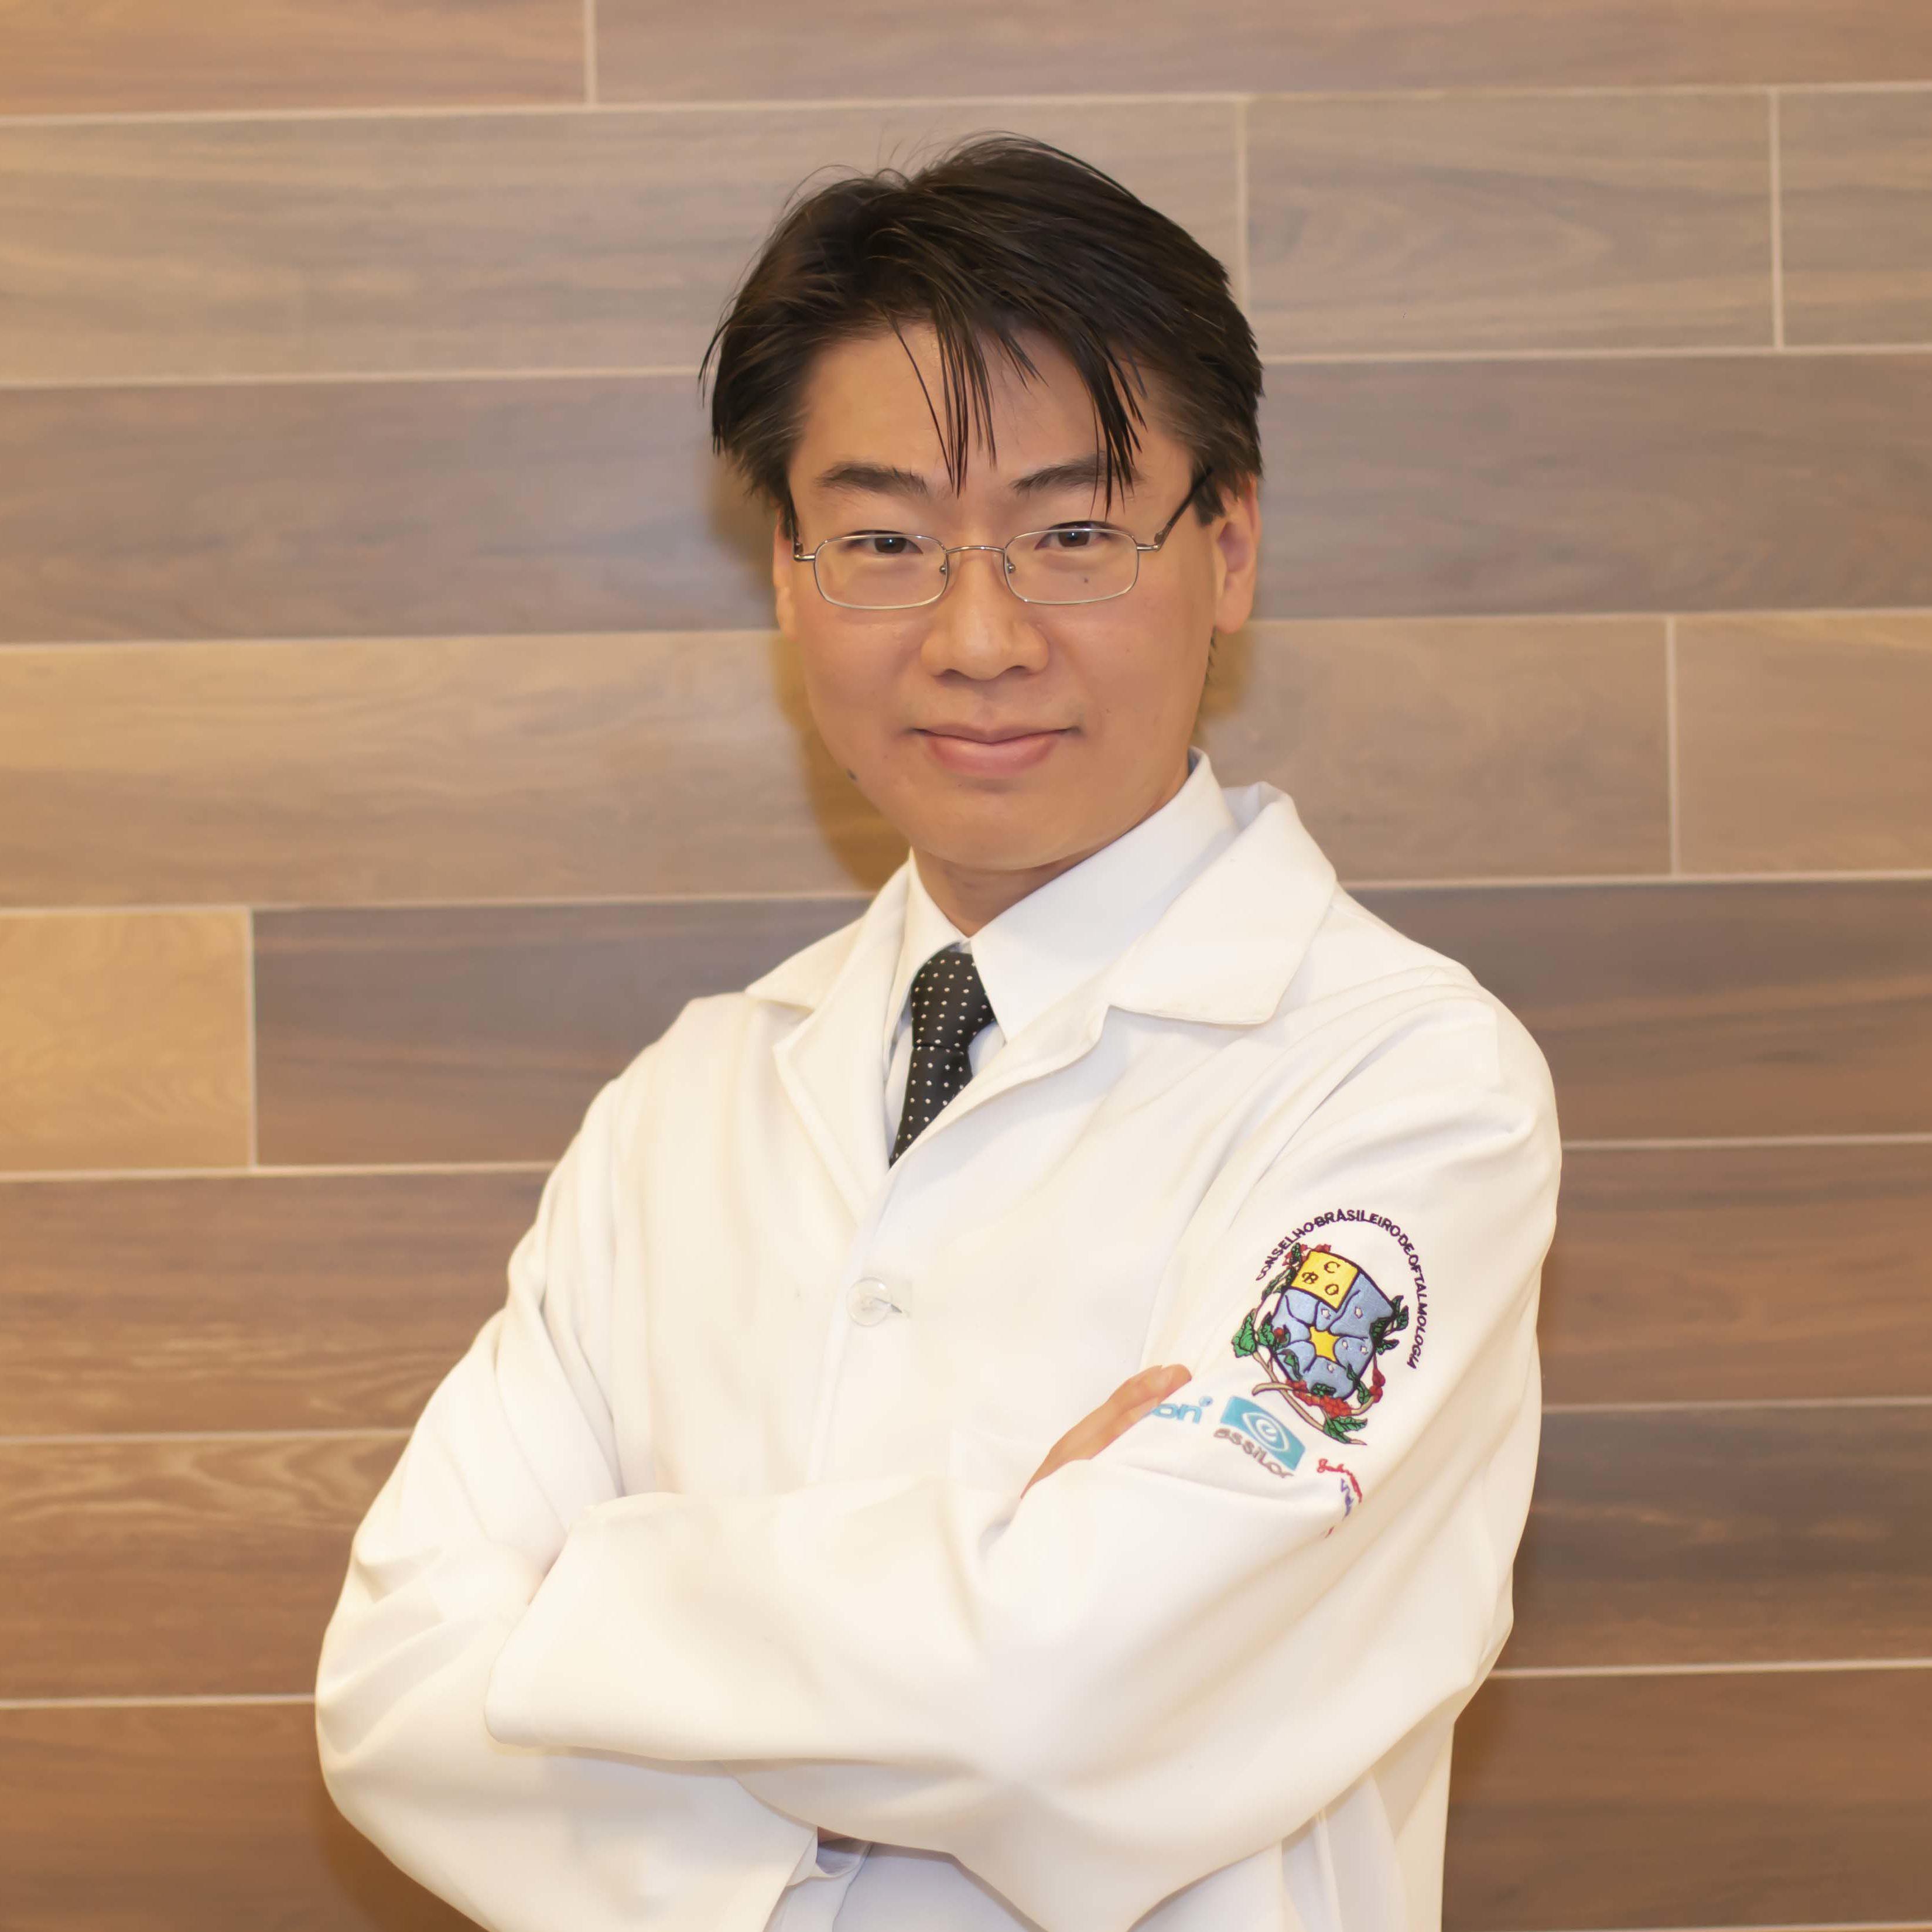 Dr. Marcos Ribeiro Chin